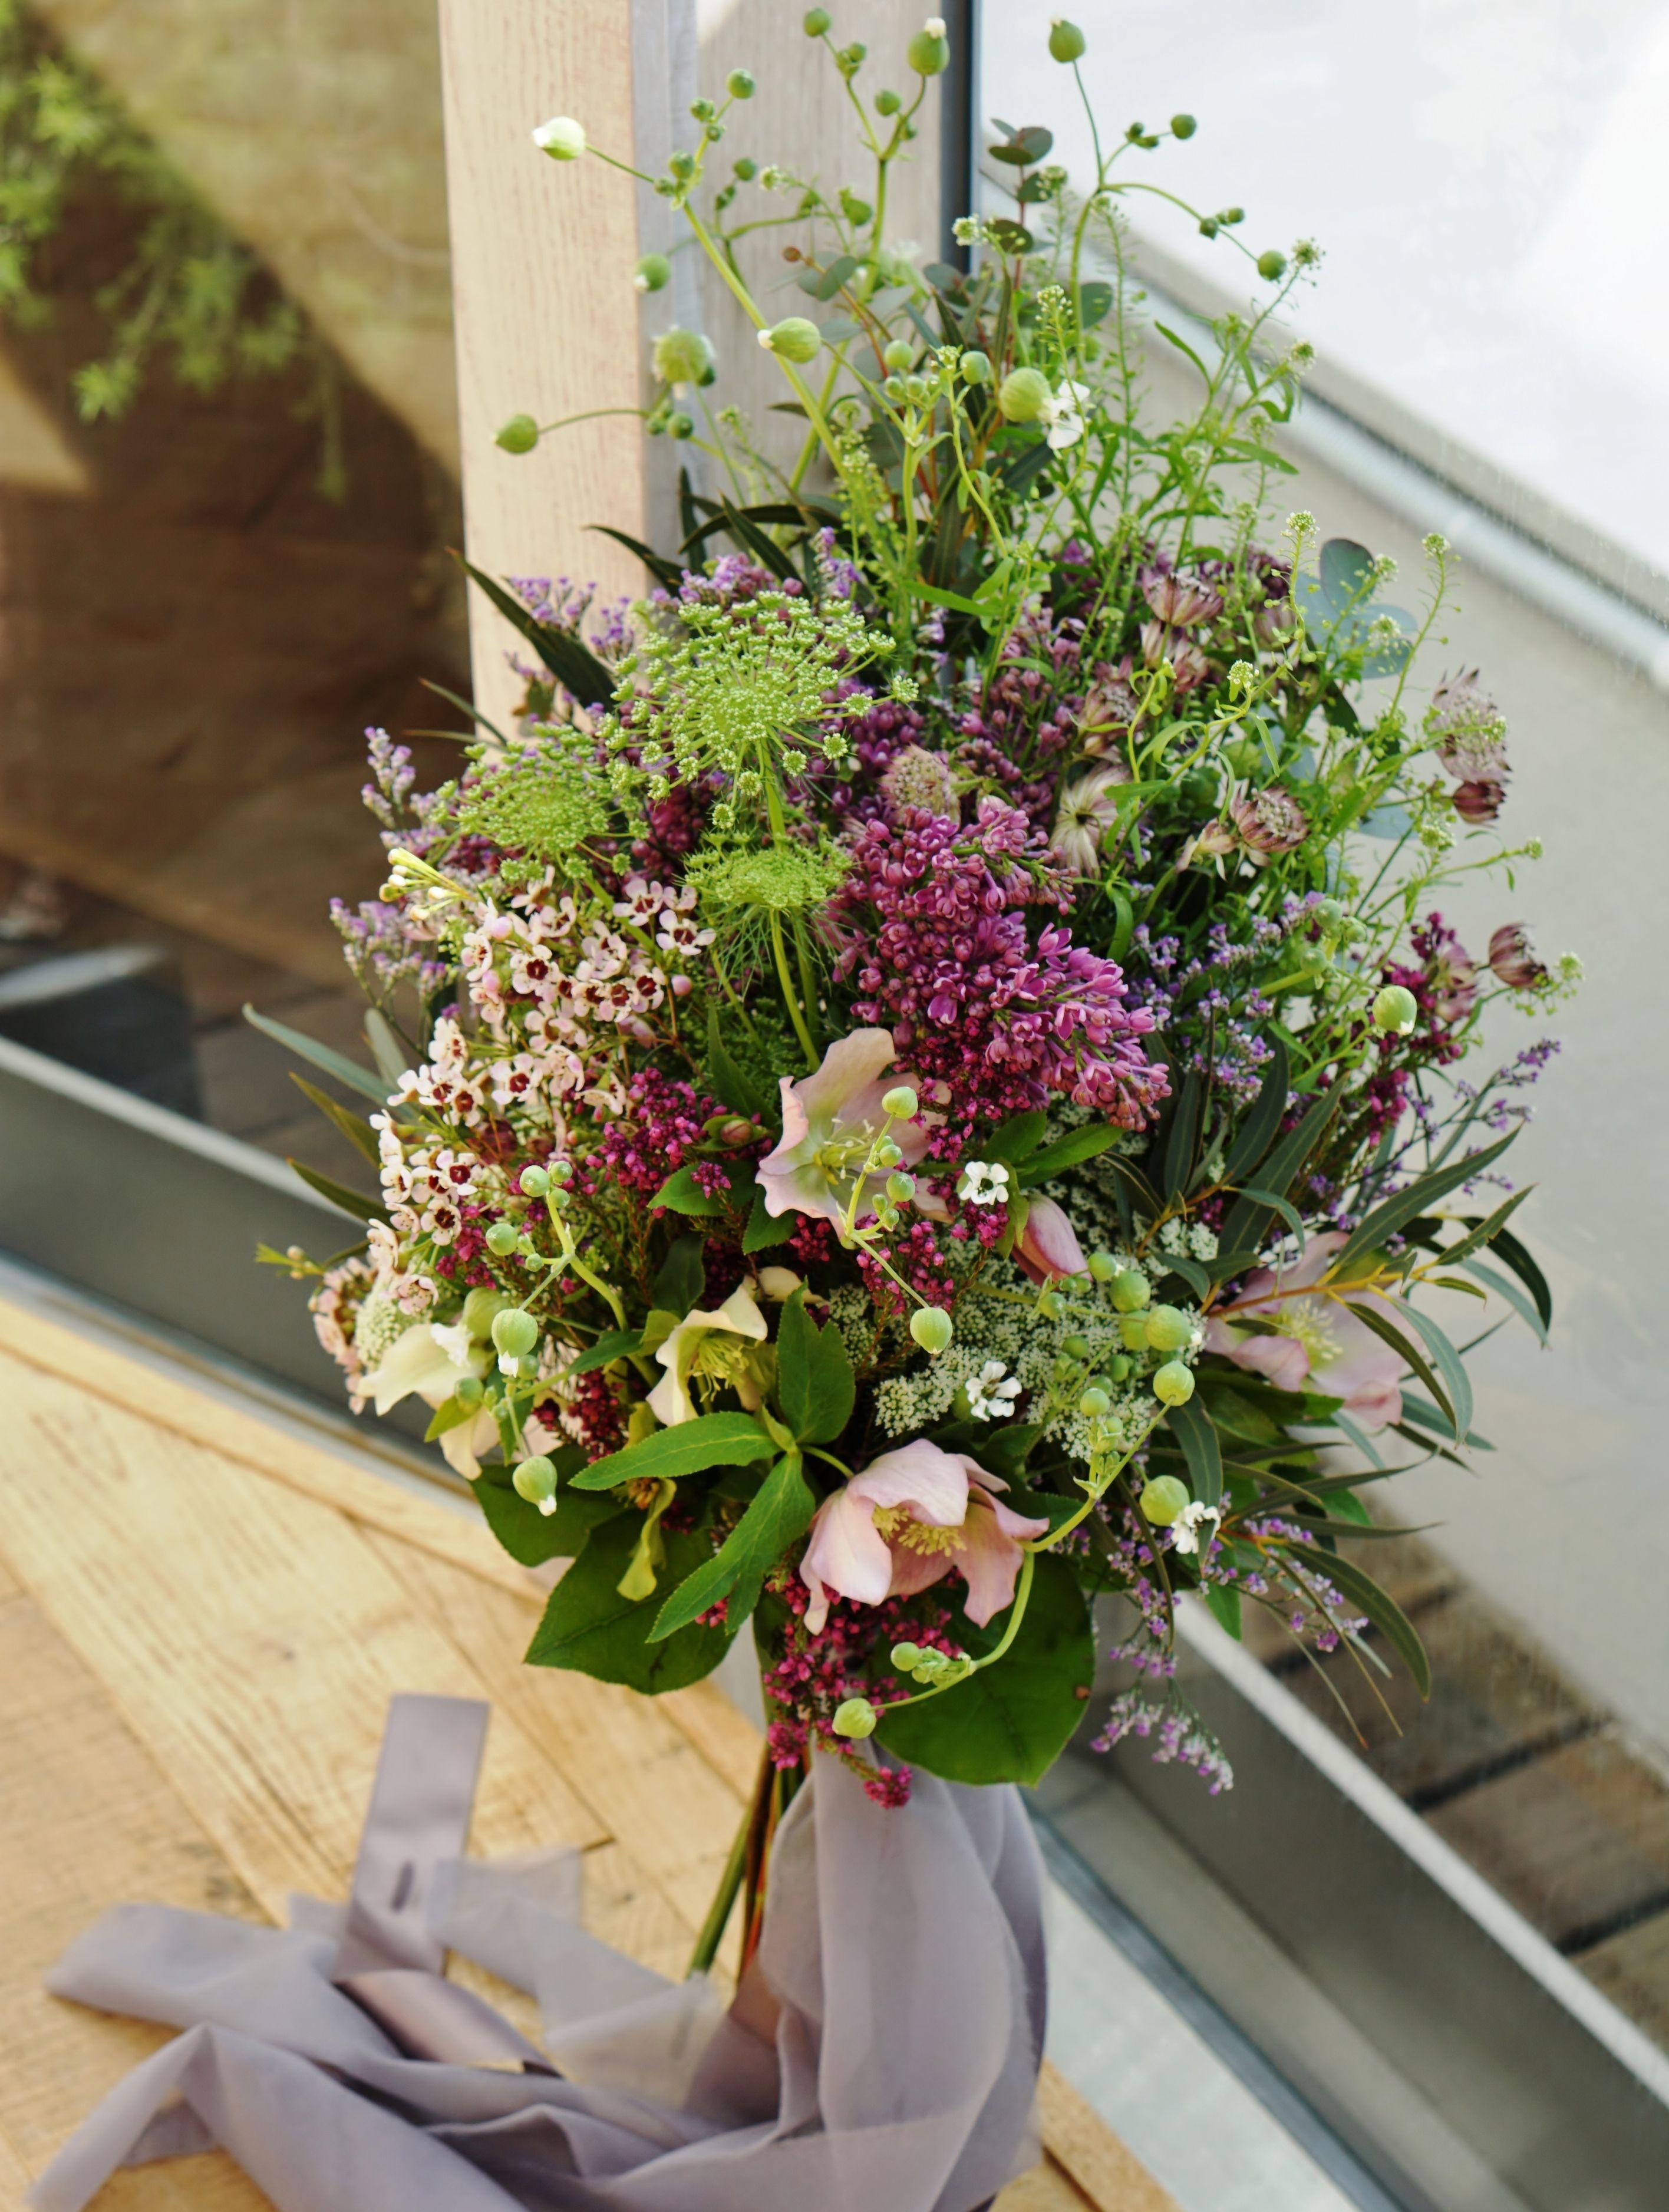 Novaresevressetrosewedding bouquet natural flower bridal novaresevressetrosewedding bouquet natural flower bridal izmirmasajfo